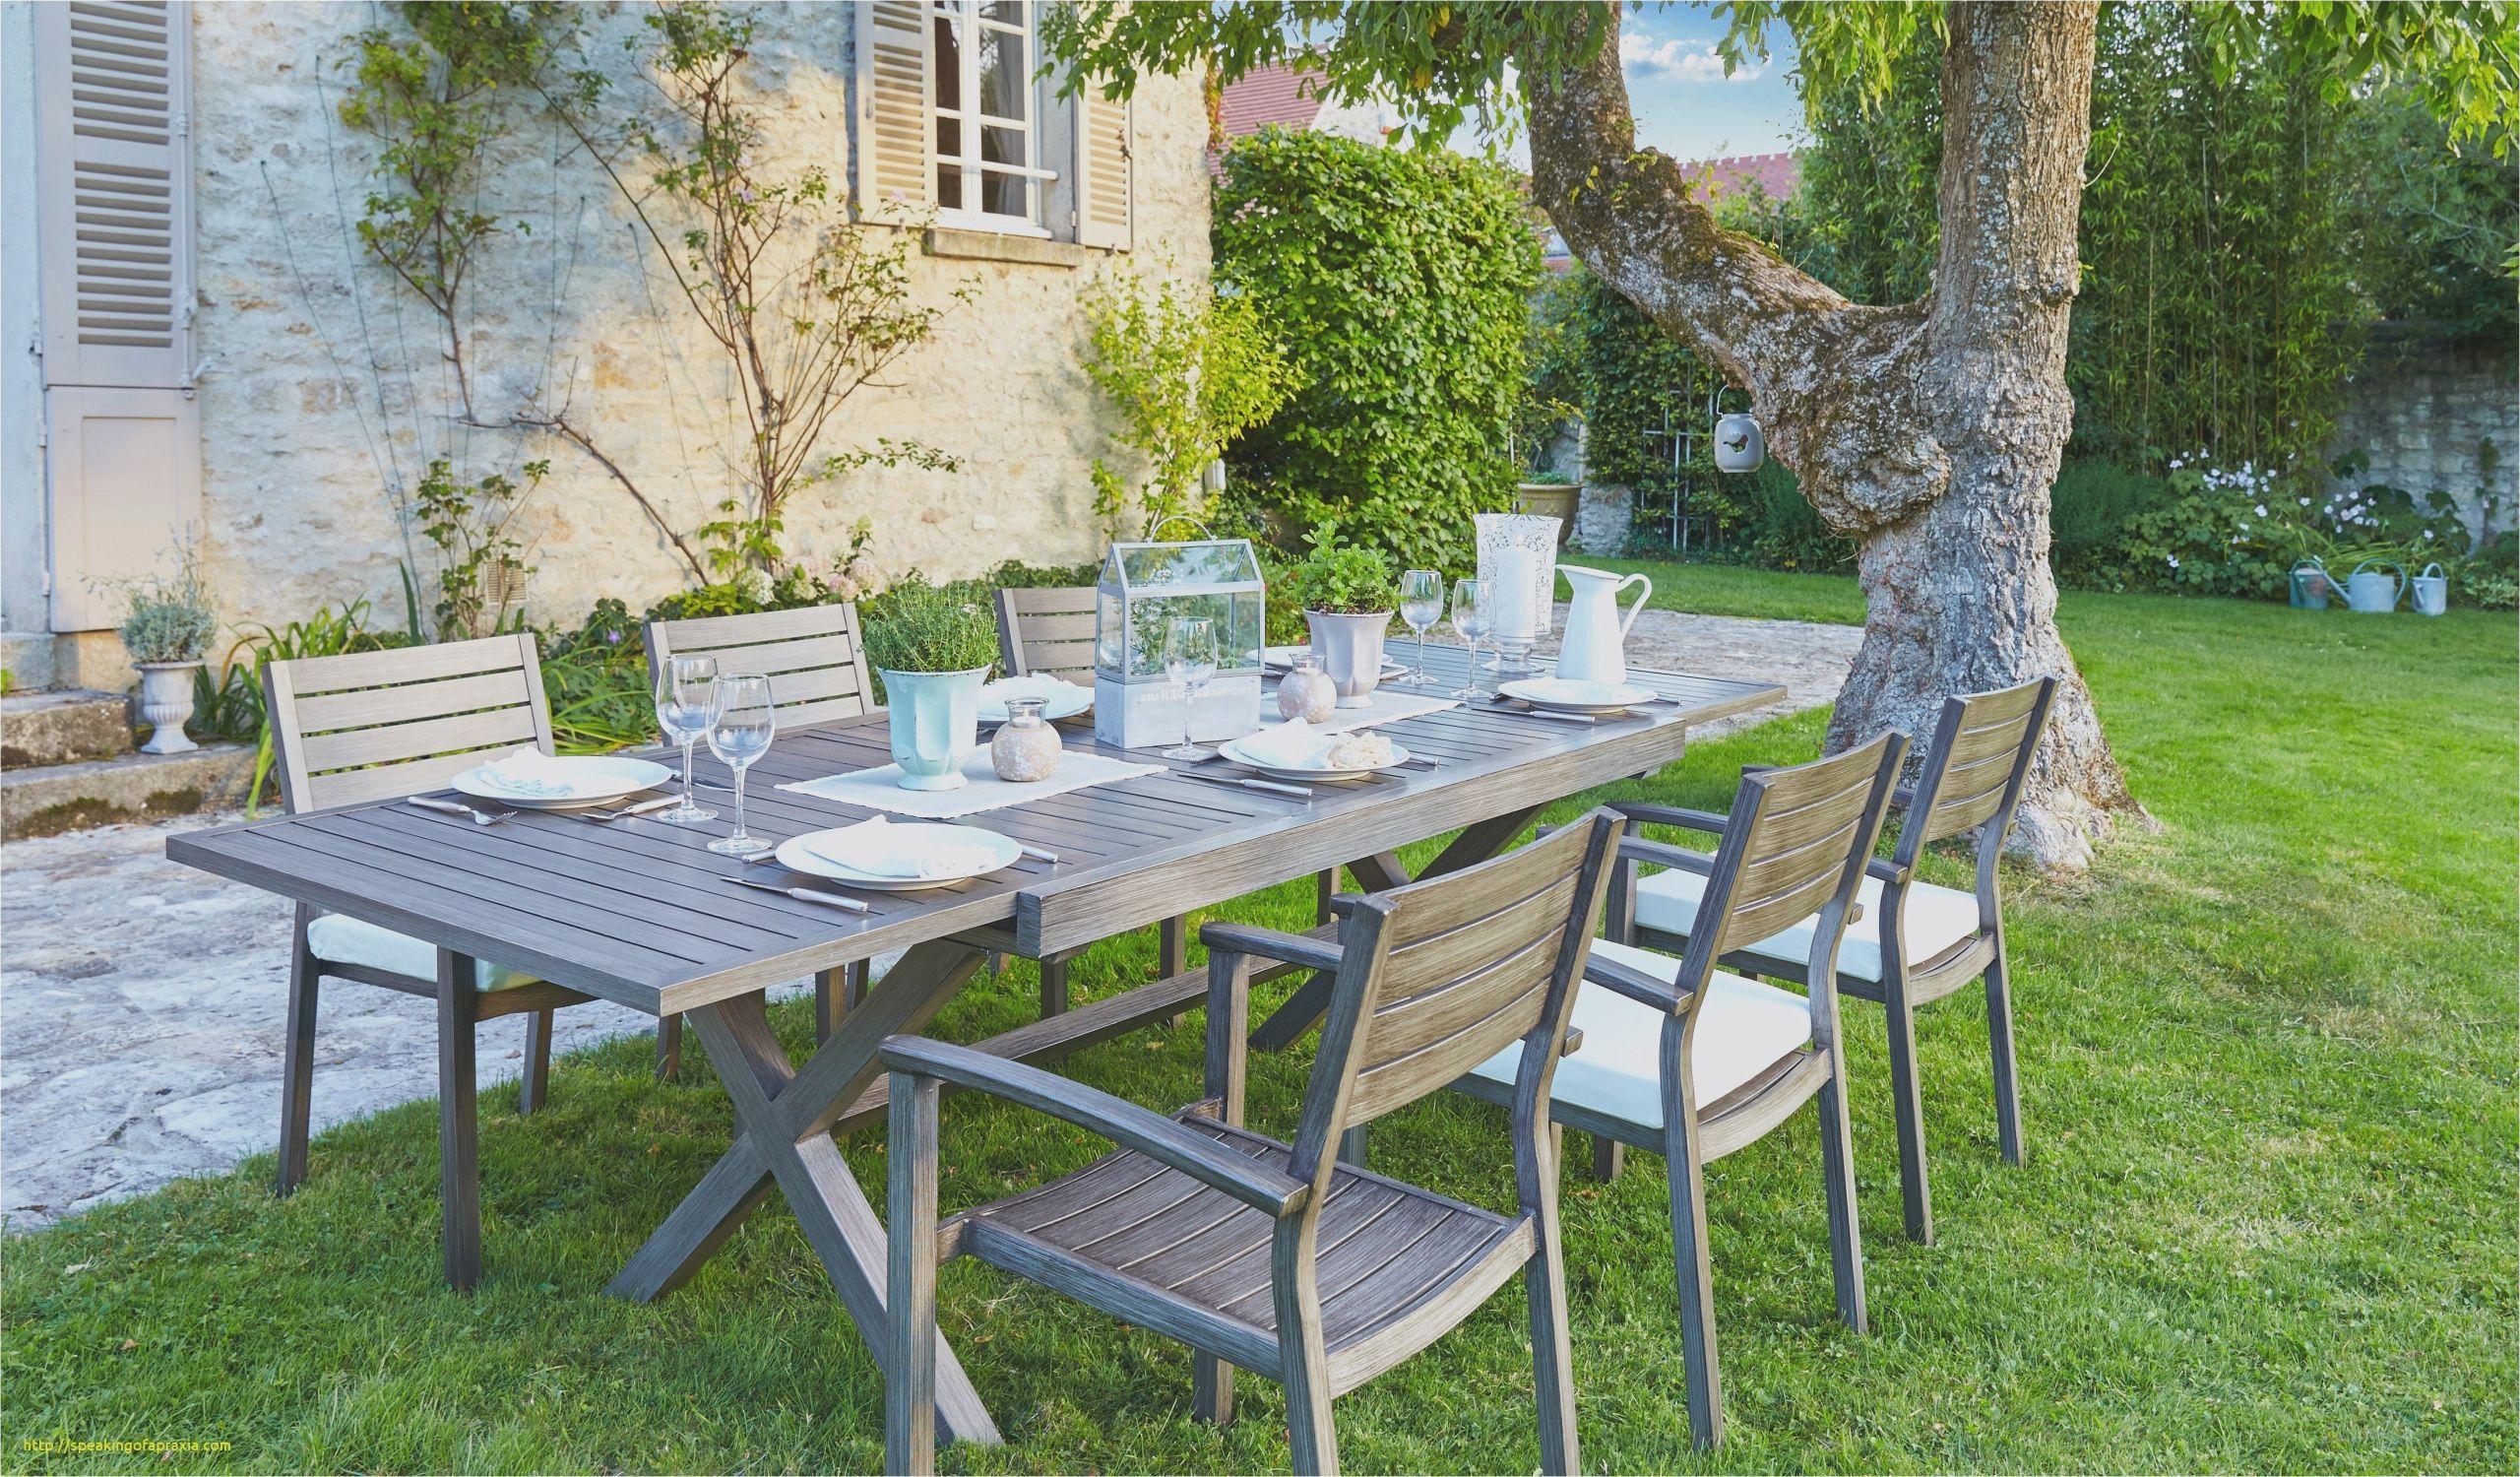 40 Inspirant Table Exterieur Carrefour   Salon Jardin à Abris De Jardin Carrefour